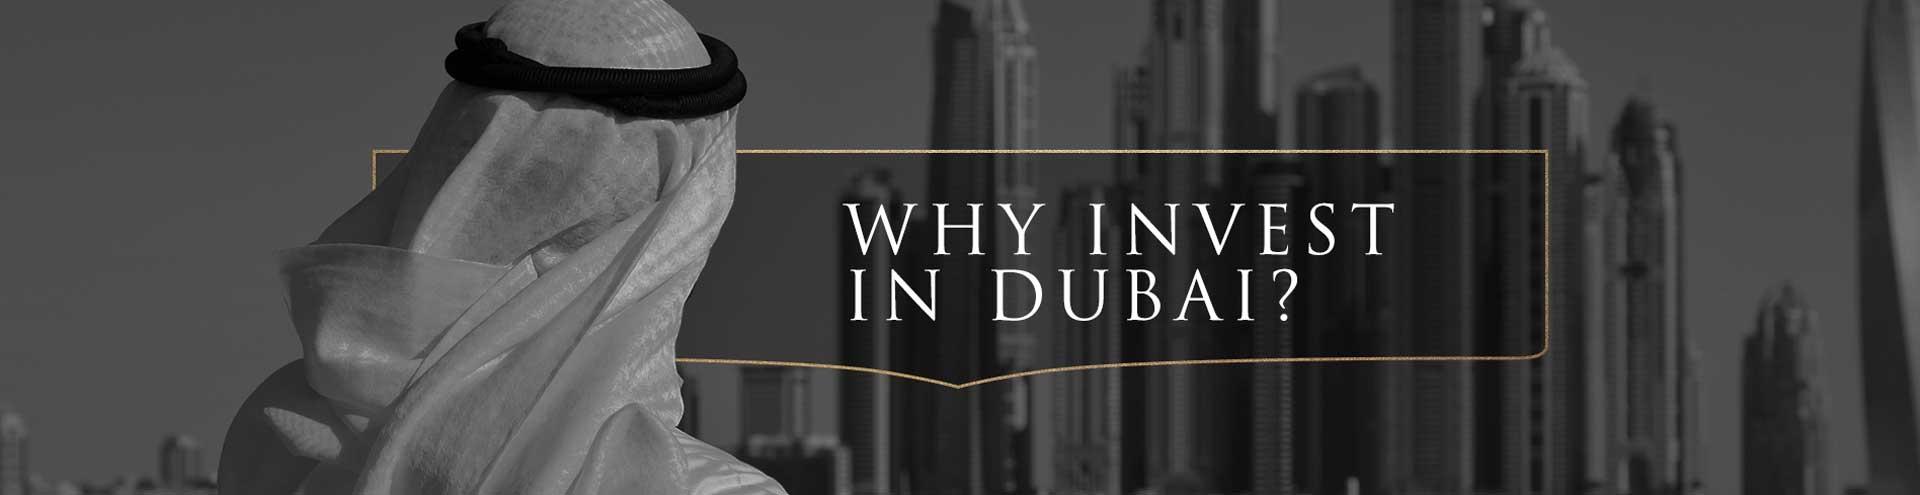 why-invest-in-dubai-banner-vincitore-real-estate-development-llc